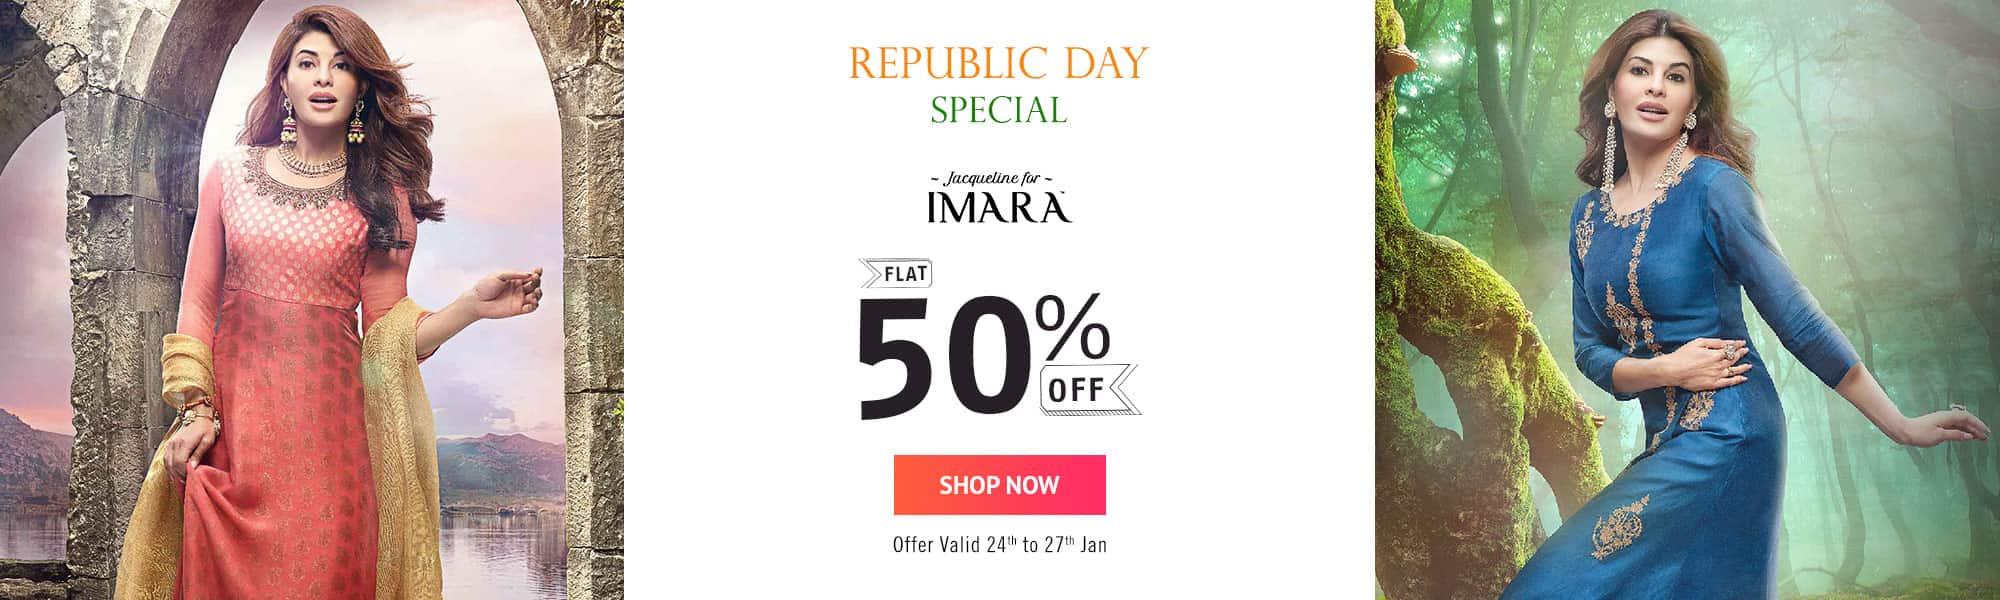 IMARA REPUBLIC DAY OFFER